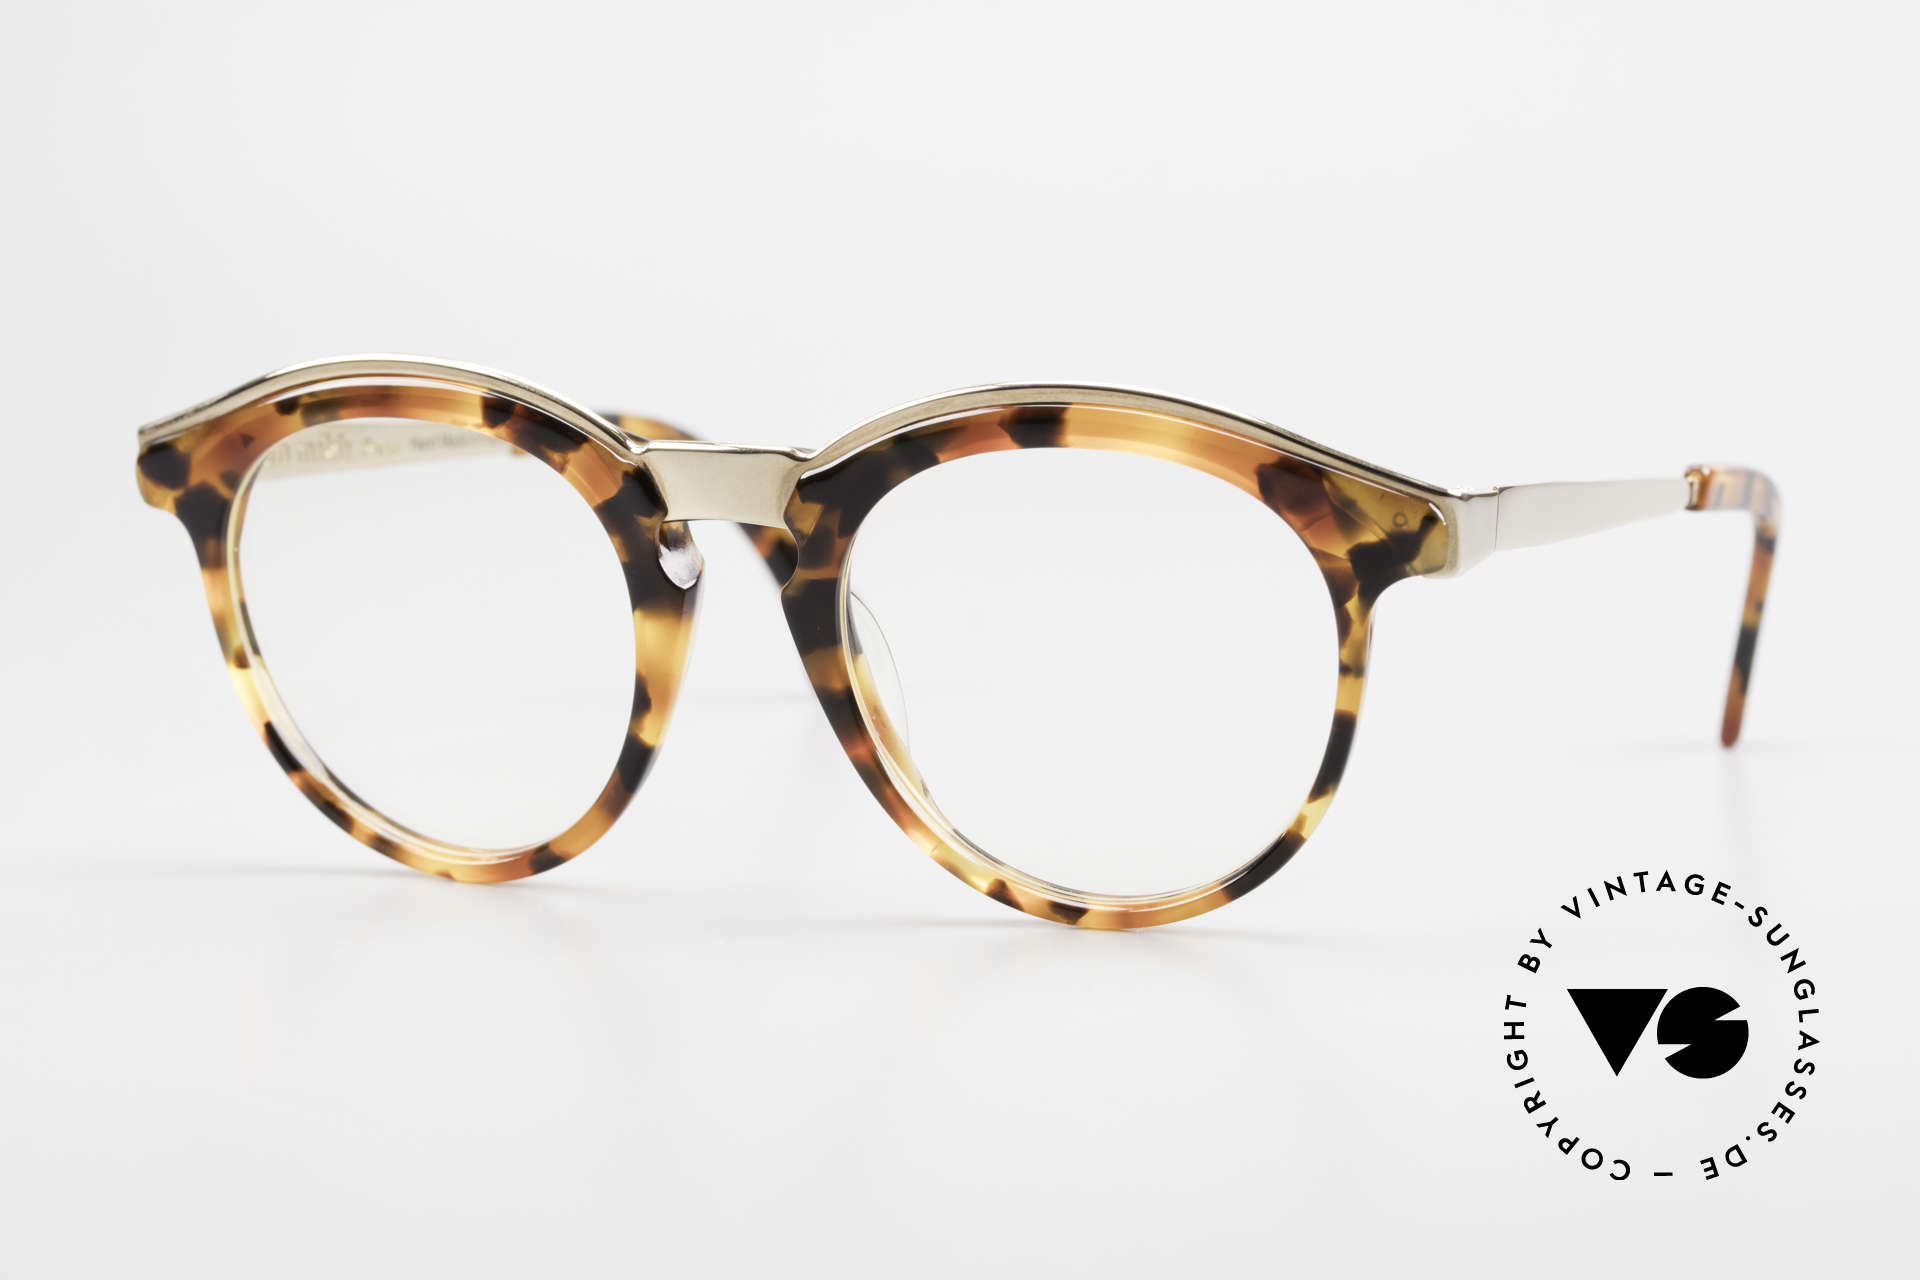 Alain Mikli 626 / 281 Old 80's Vintage Panto Glasses, round vintage designer eyeglasses by ALAIN MIKLI, Made for Men